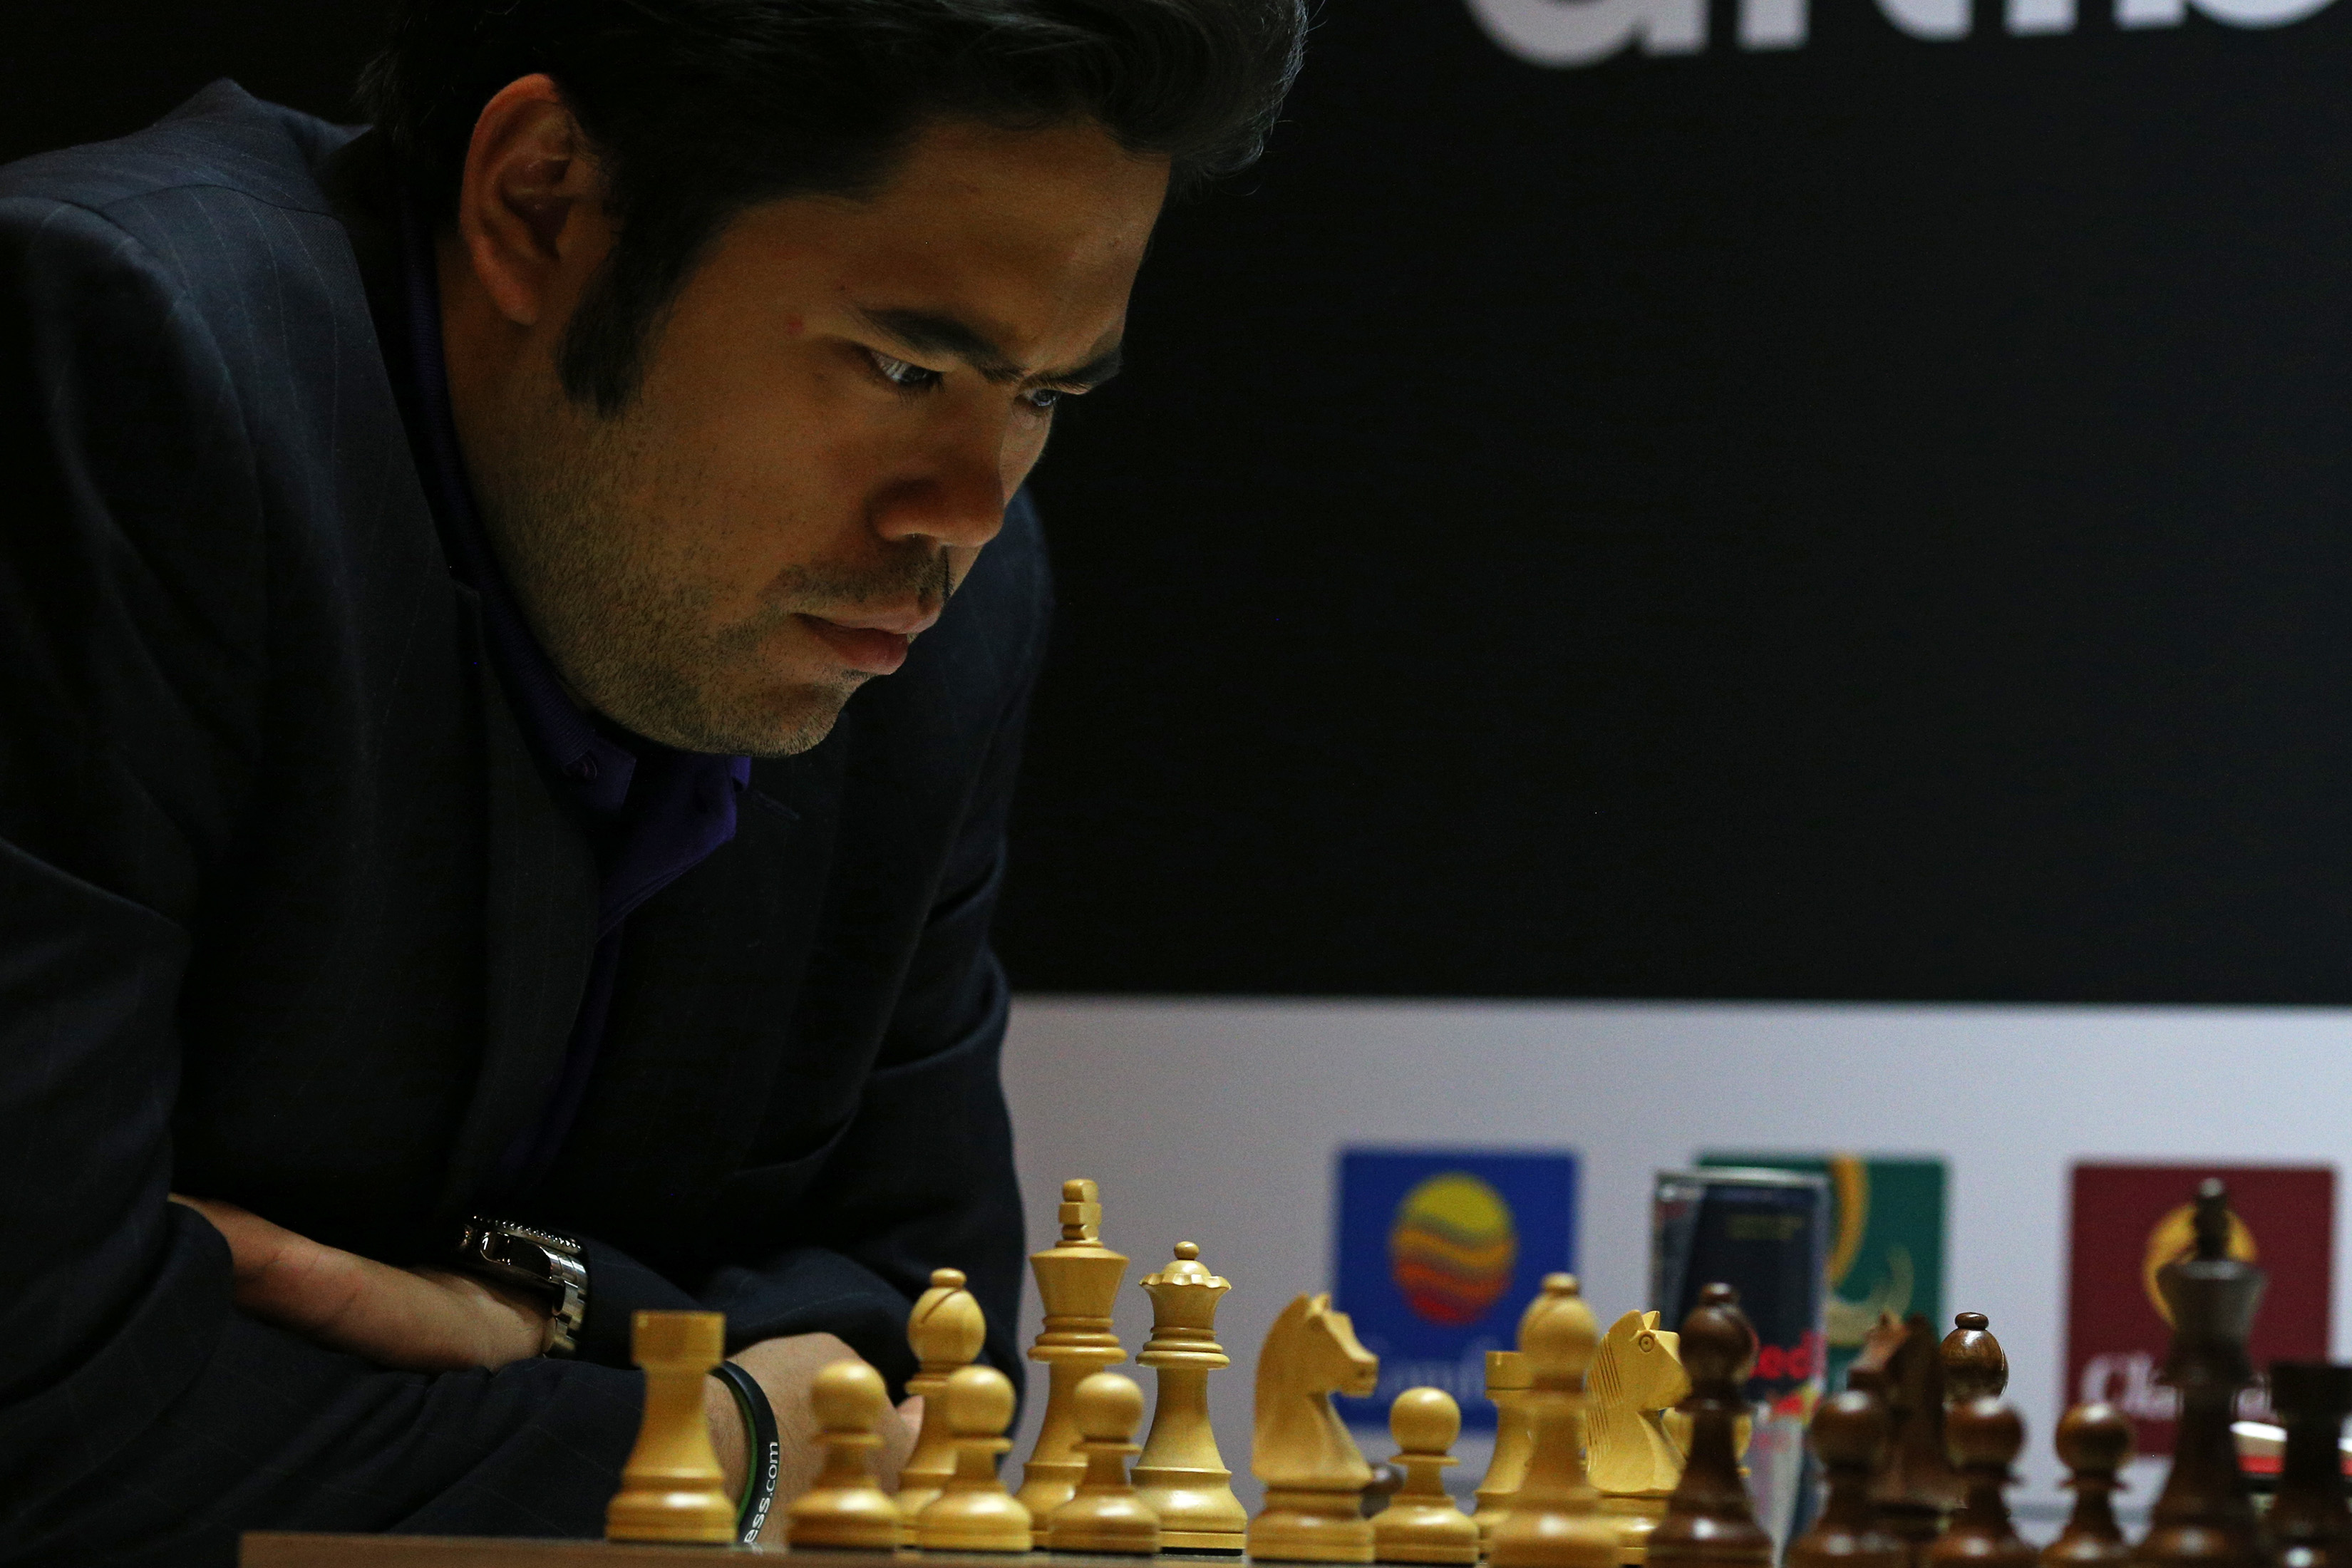 Hikaru Nakamura gazes at a chess board